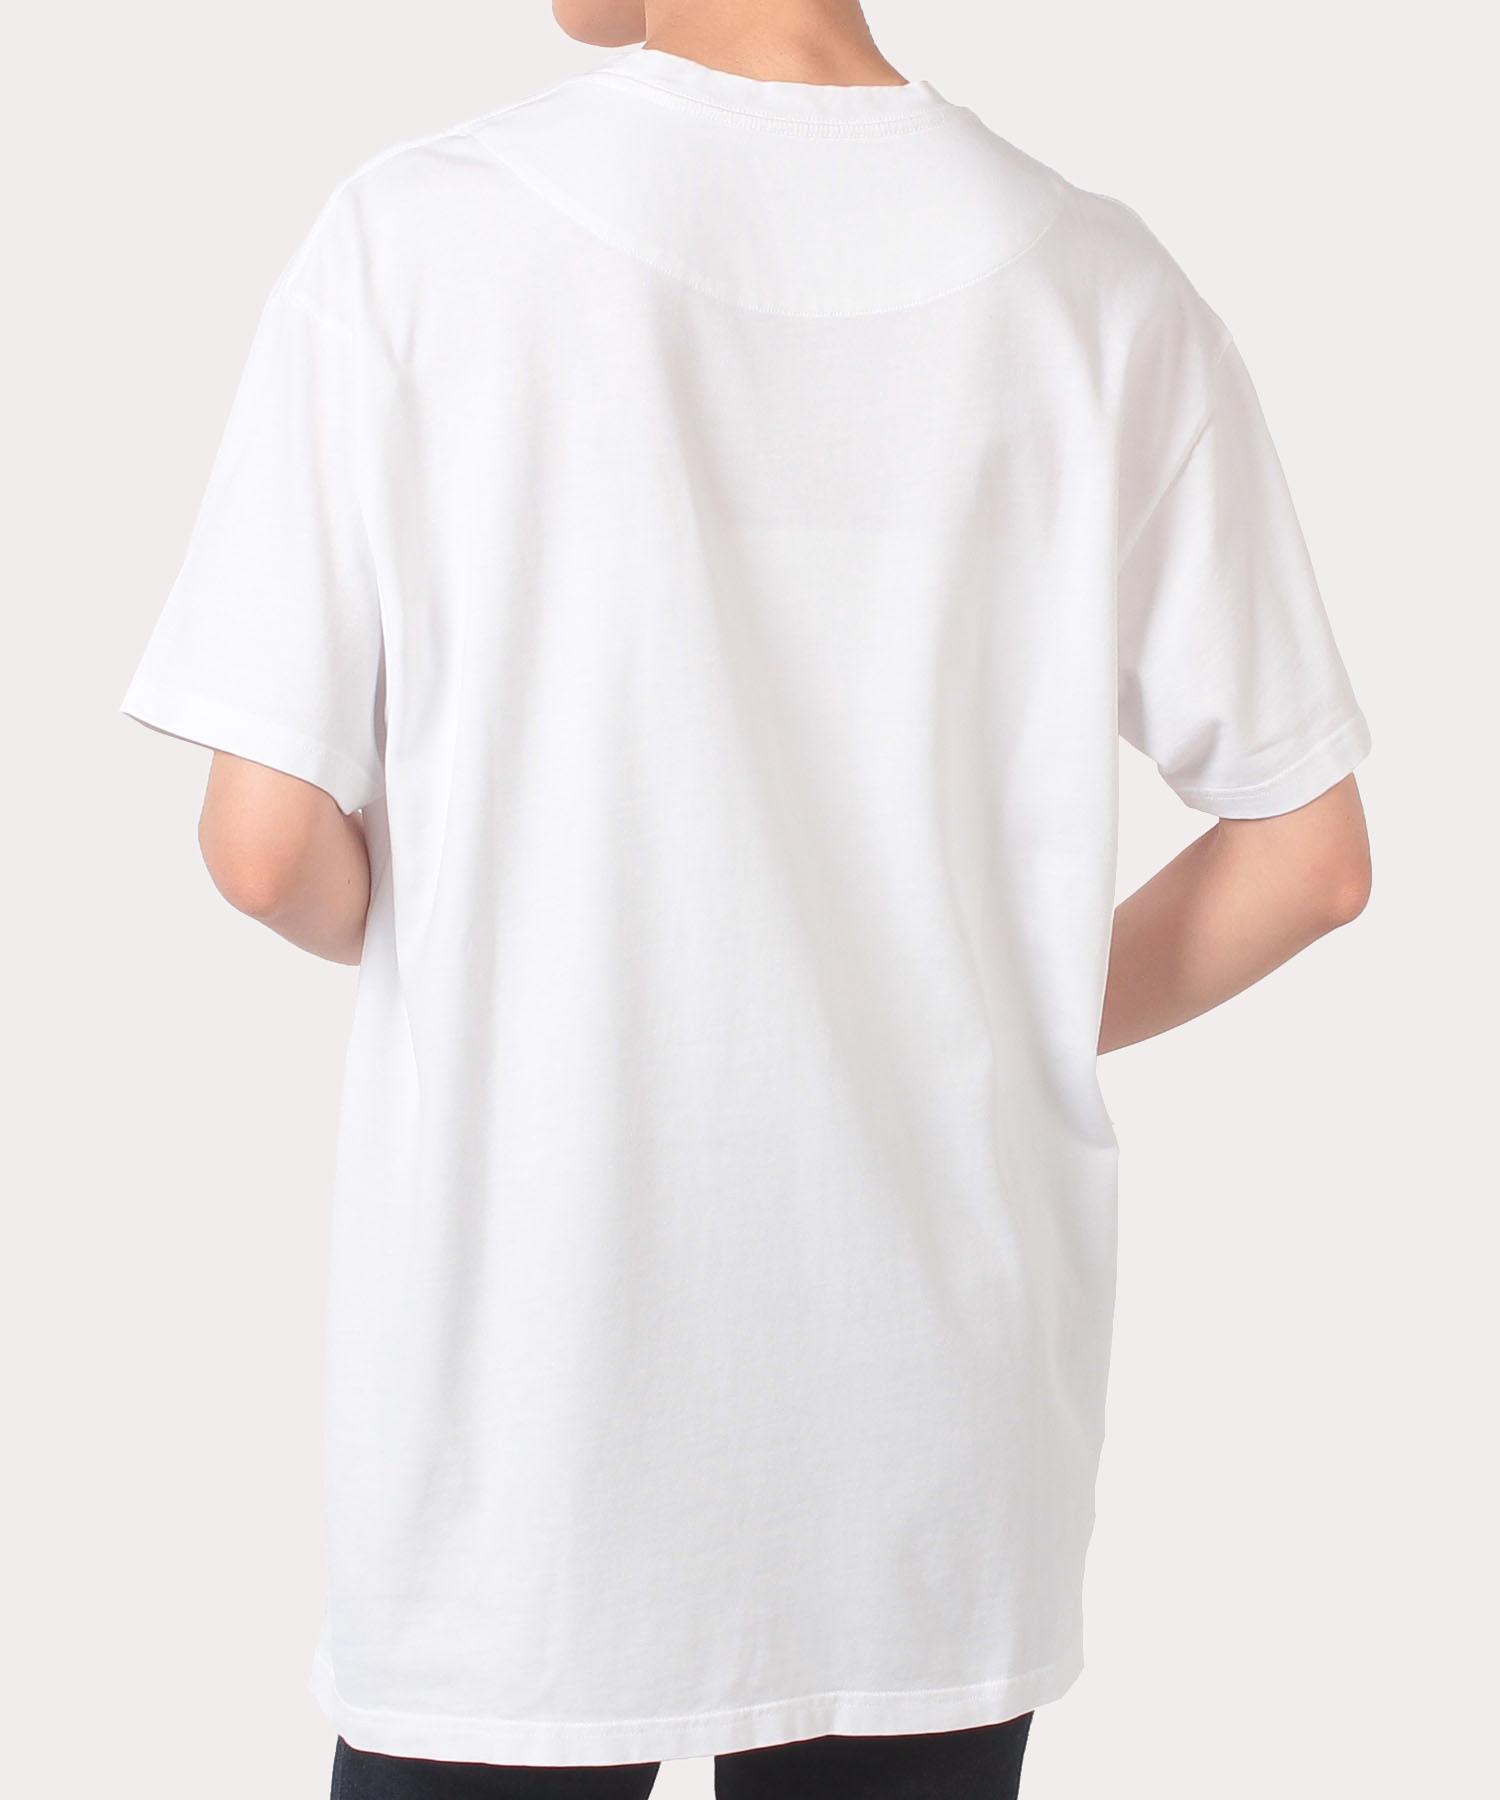 CUTLASS ORB NEW BOXY Tシャツ